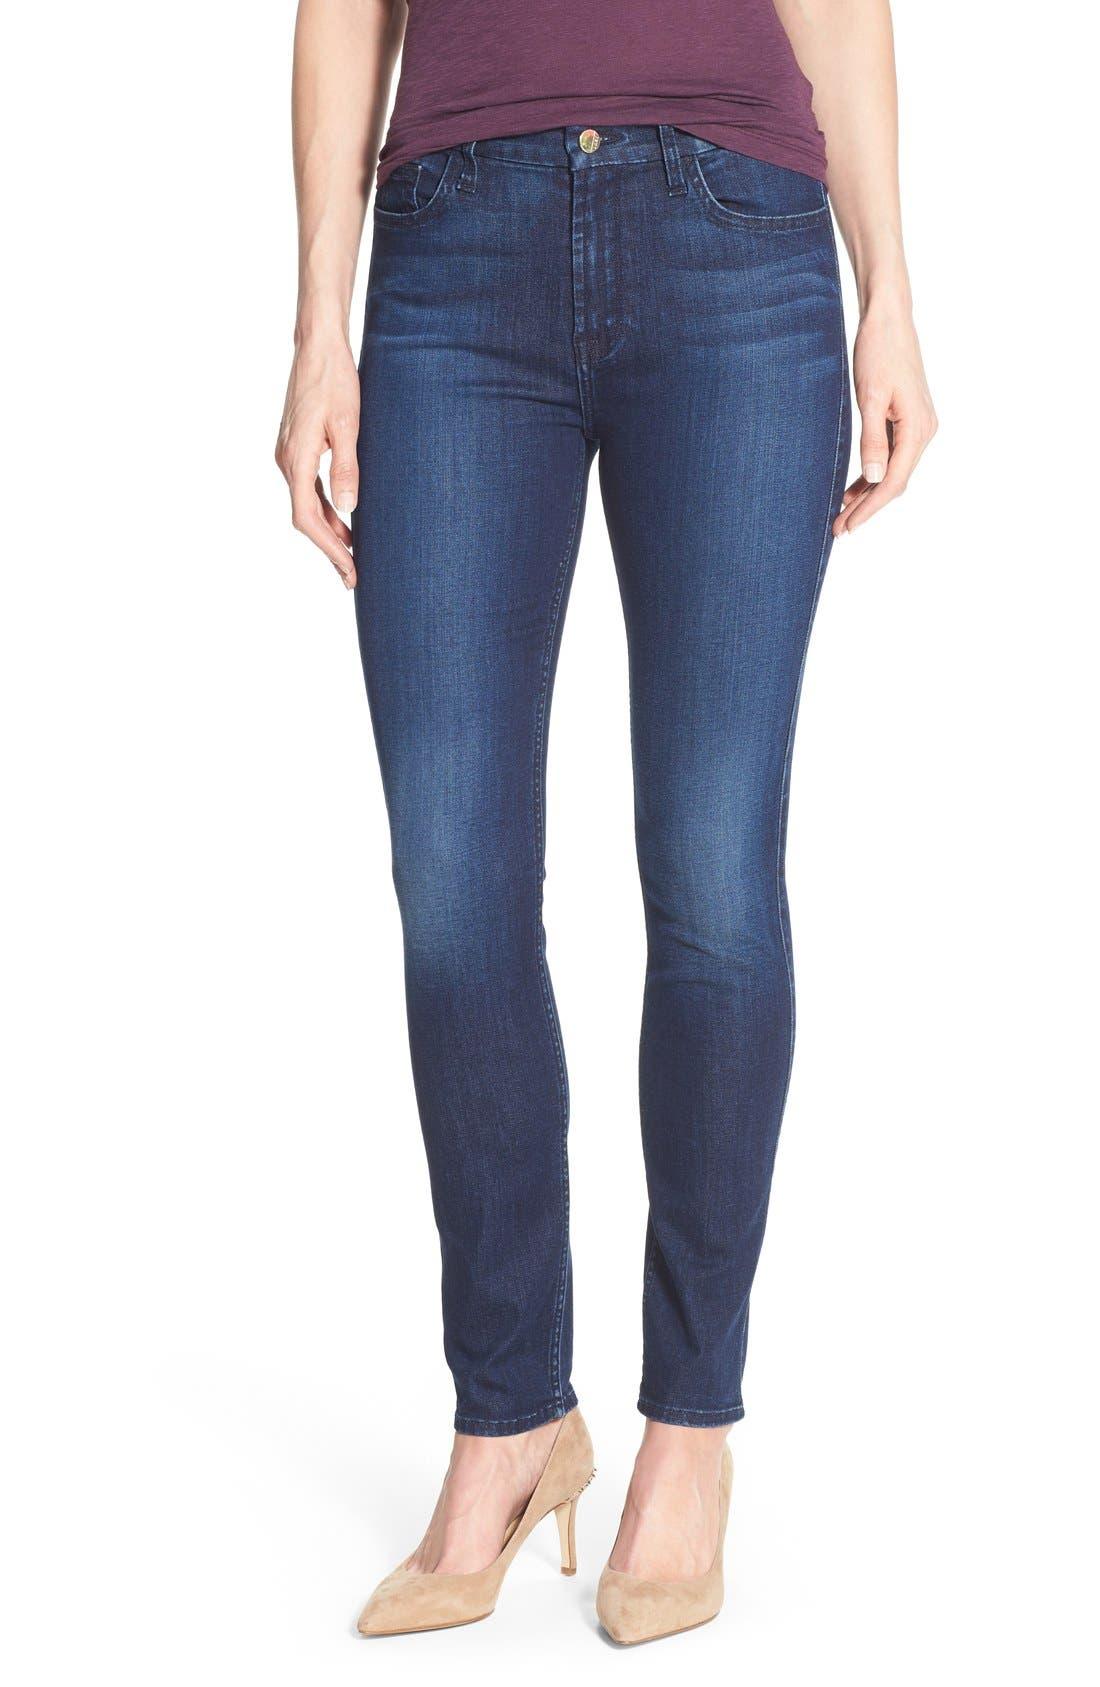 Jen7 Stretch Skinny Jeans (Imperial Blue)